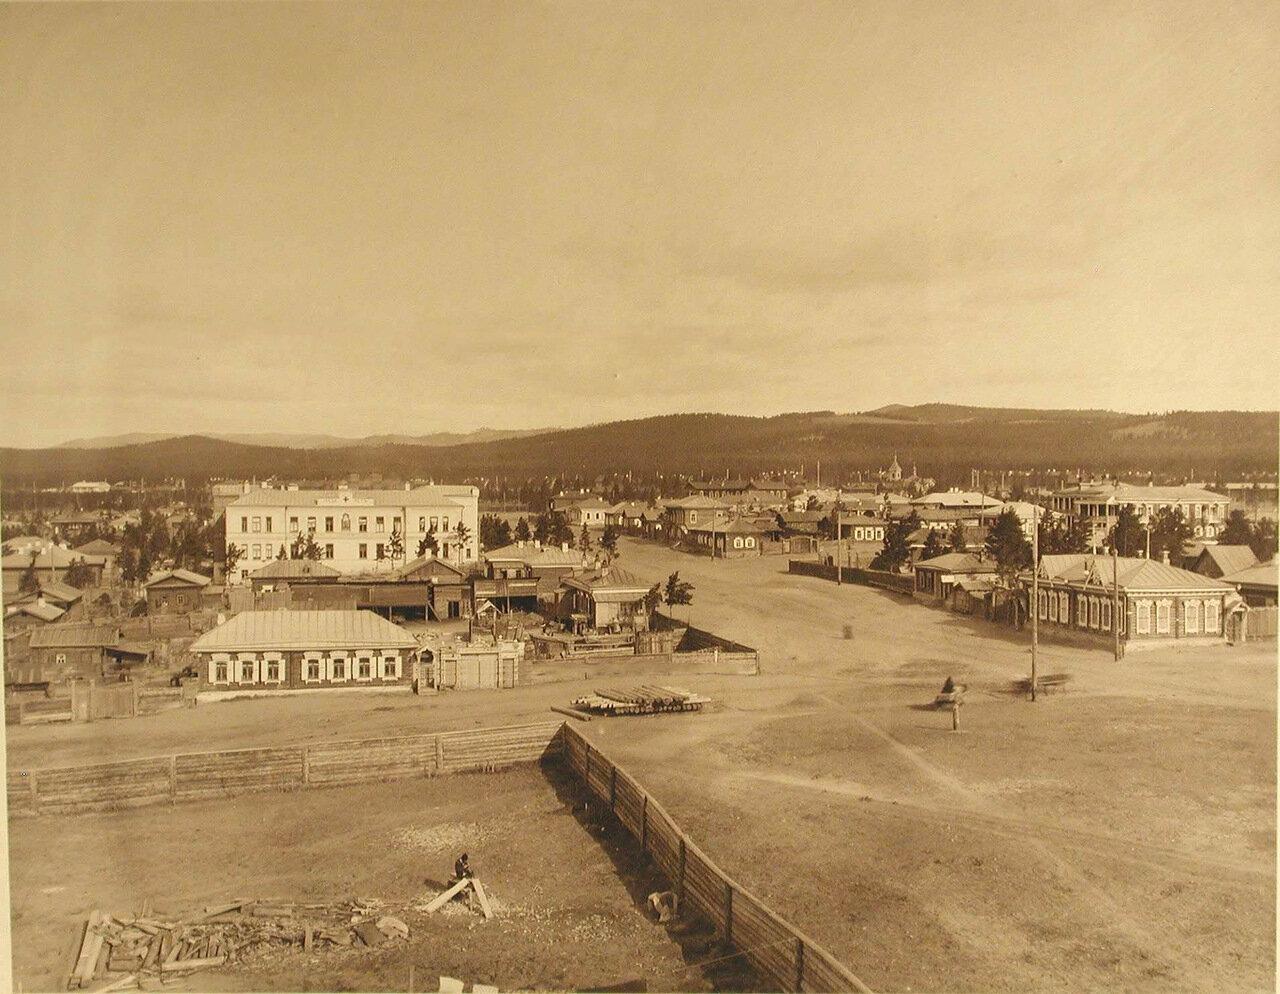 05. Вид части поселка и здание лазарета (вид сверху)